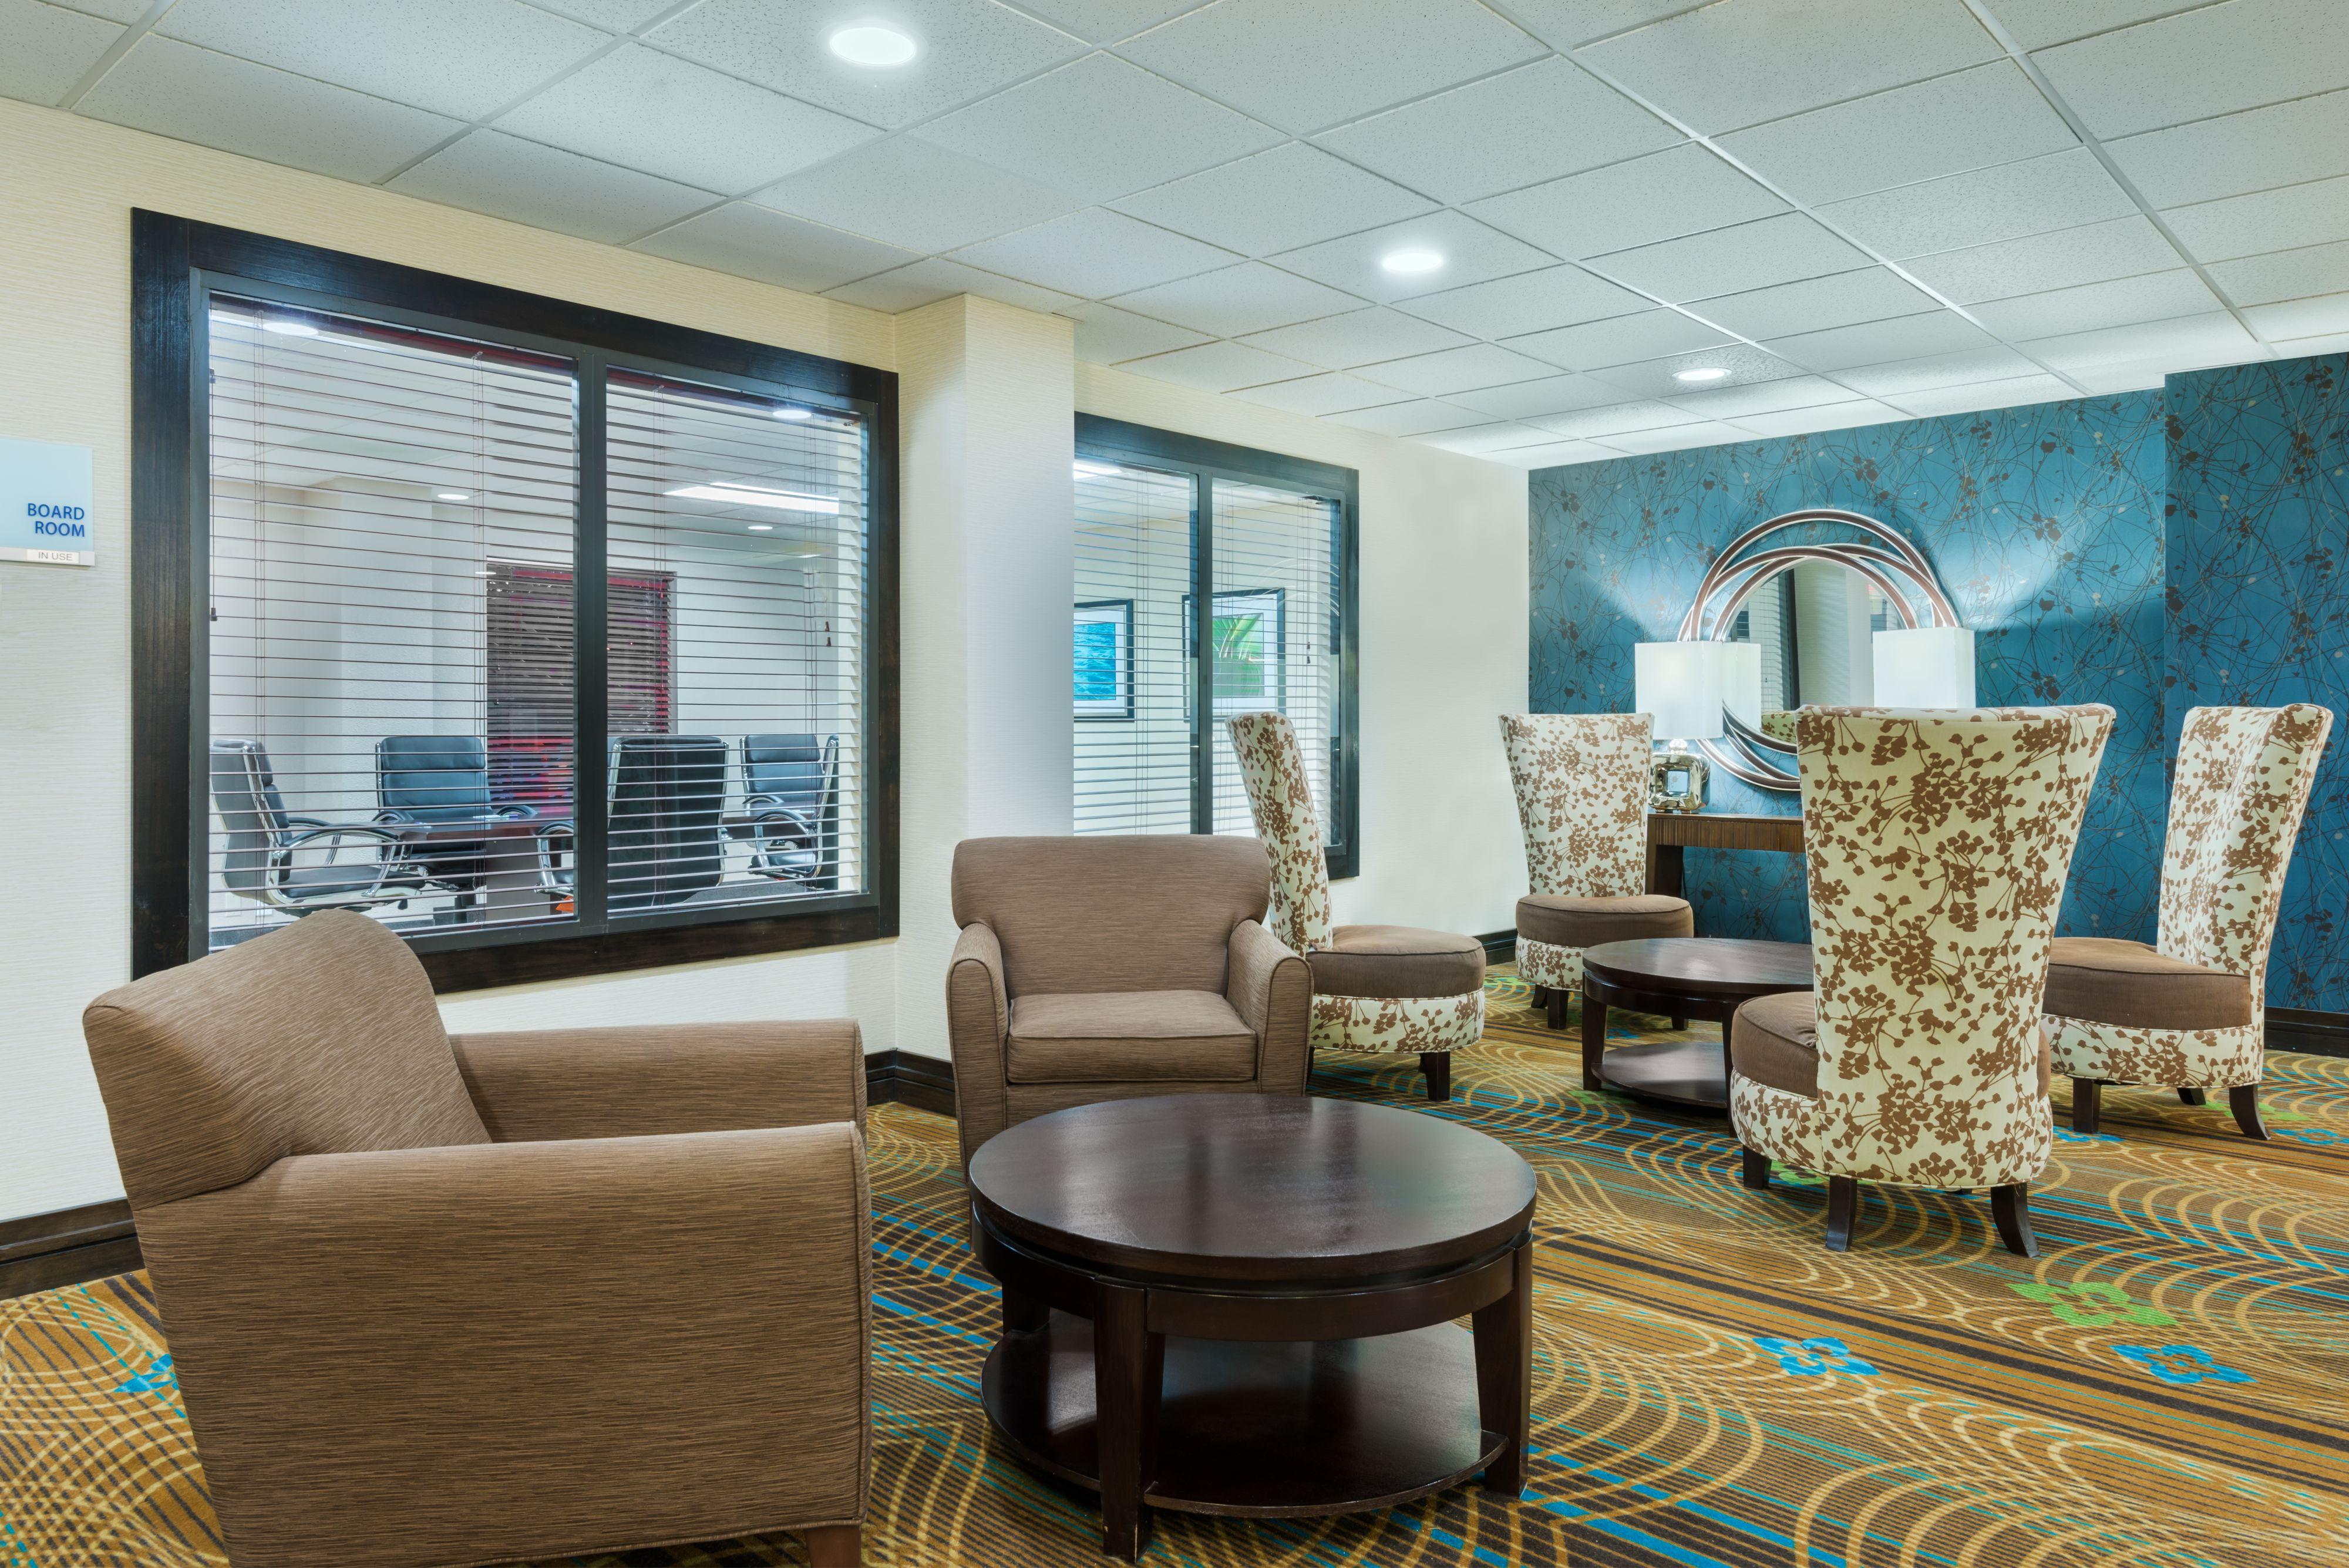 Holiday Inn Express Bentonville image 5